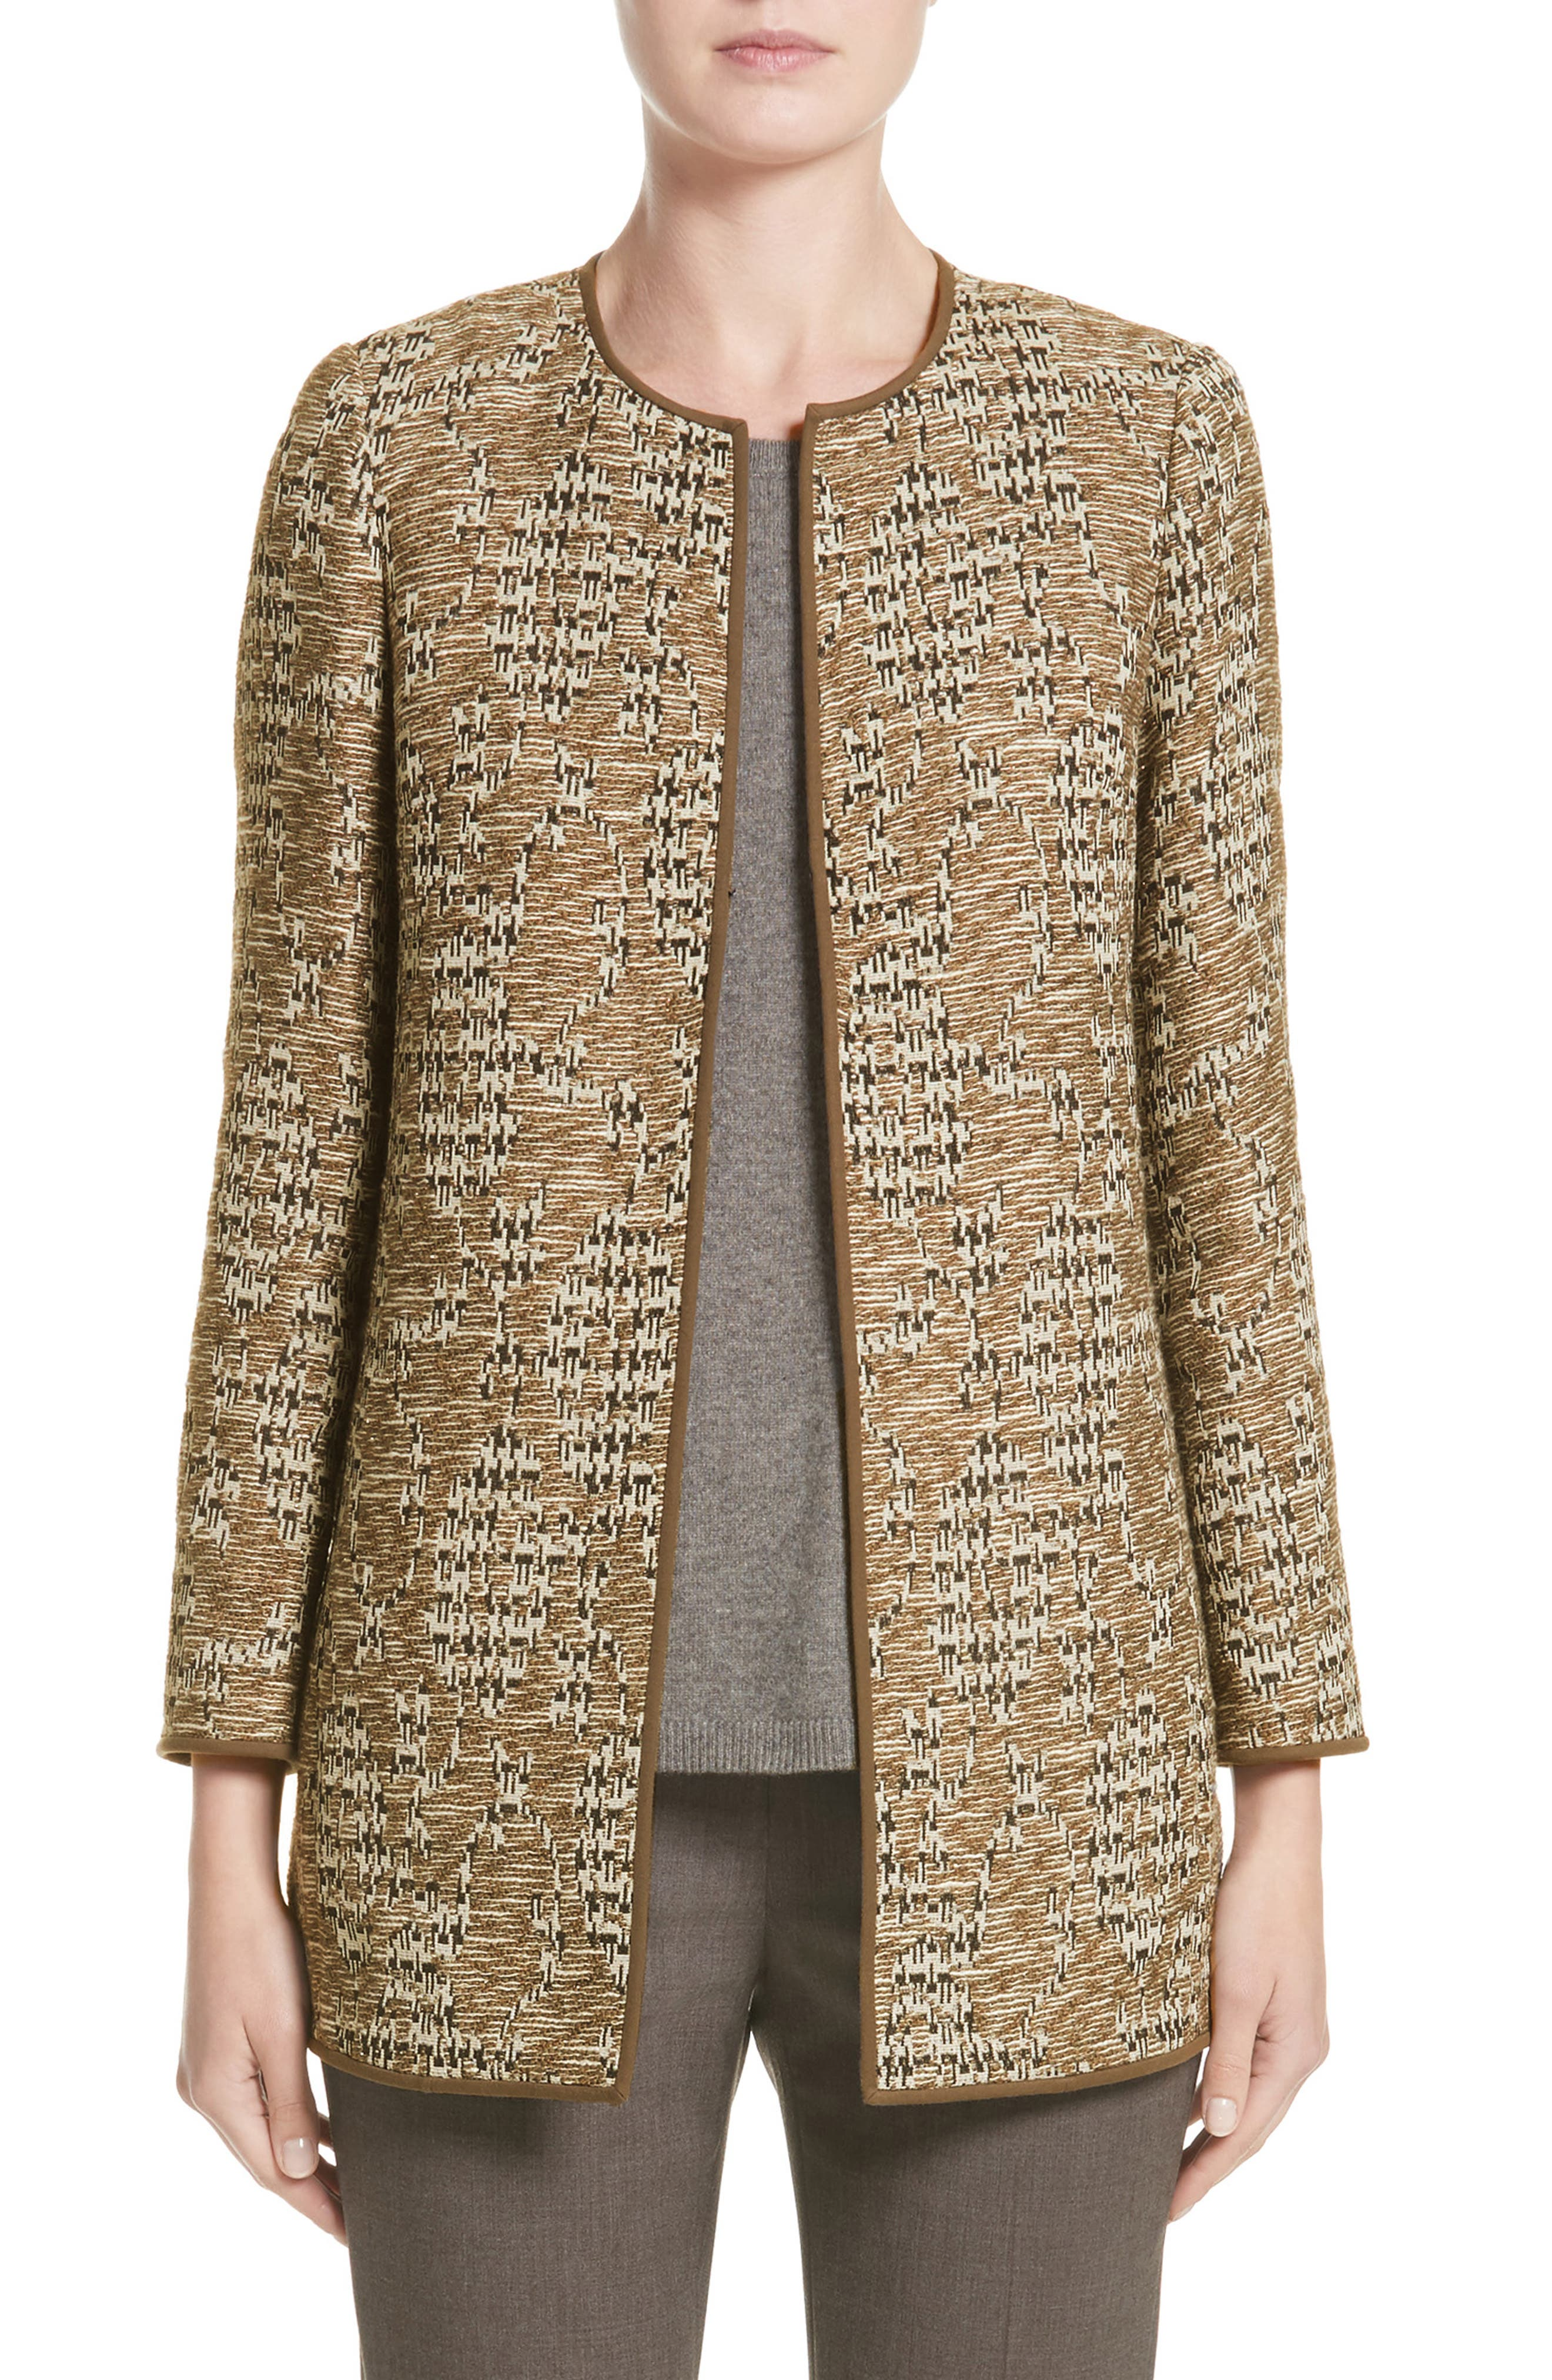 LAFAYETTE 148 NEW YORK Pria Tweed Jacket